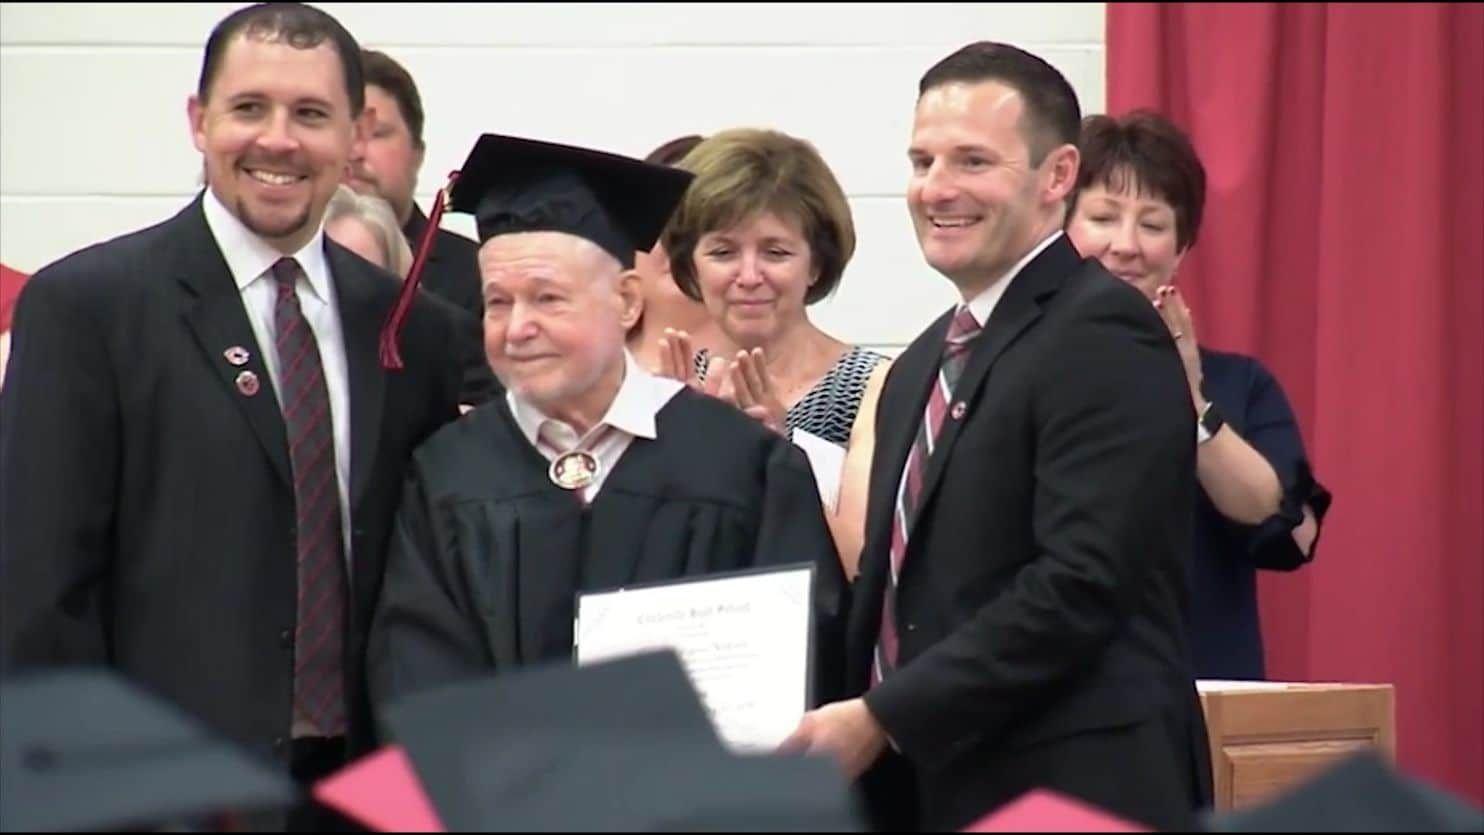 93 Year Old World War Ii Vet Finally Gets High School